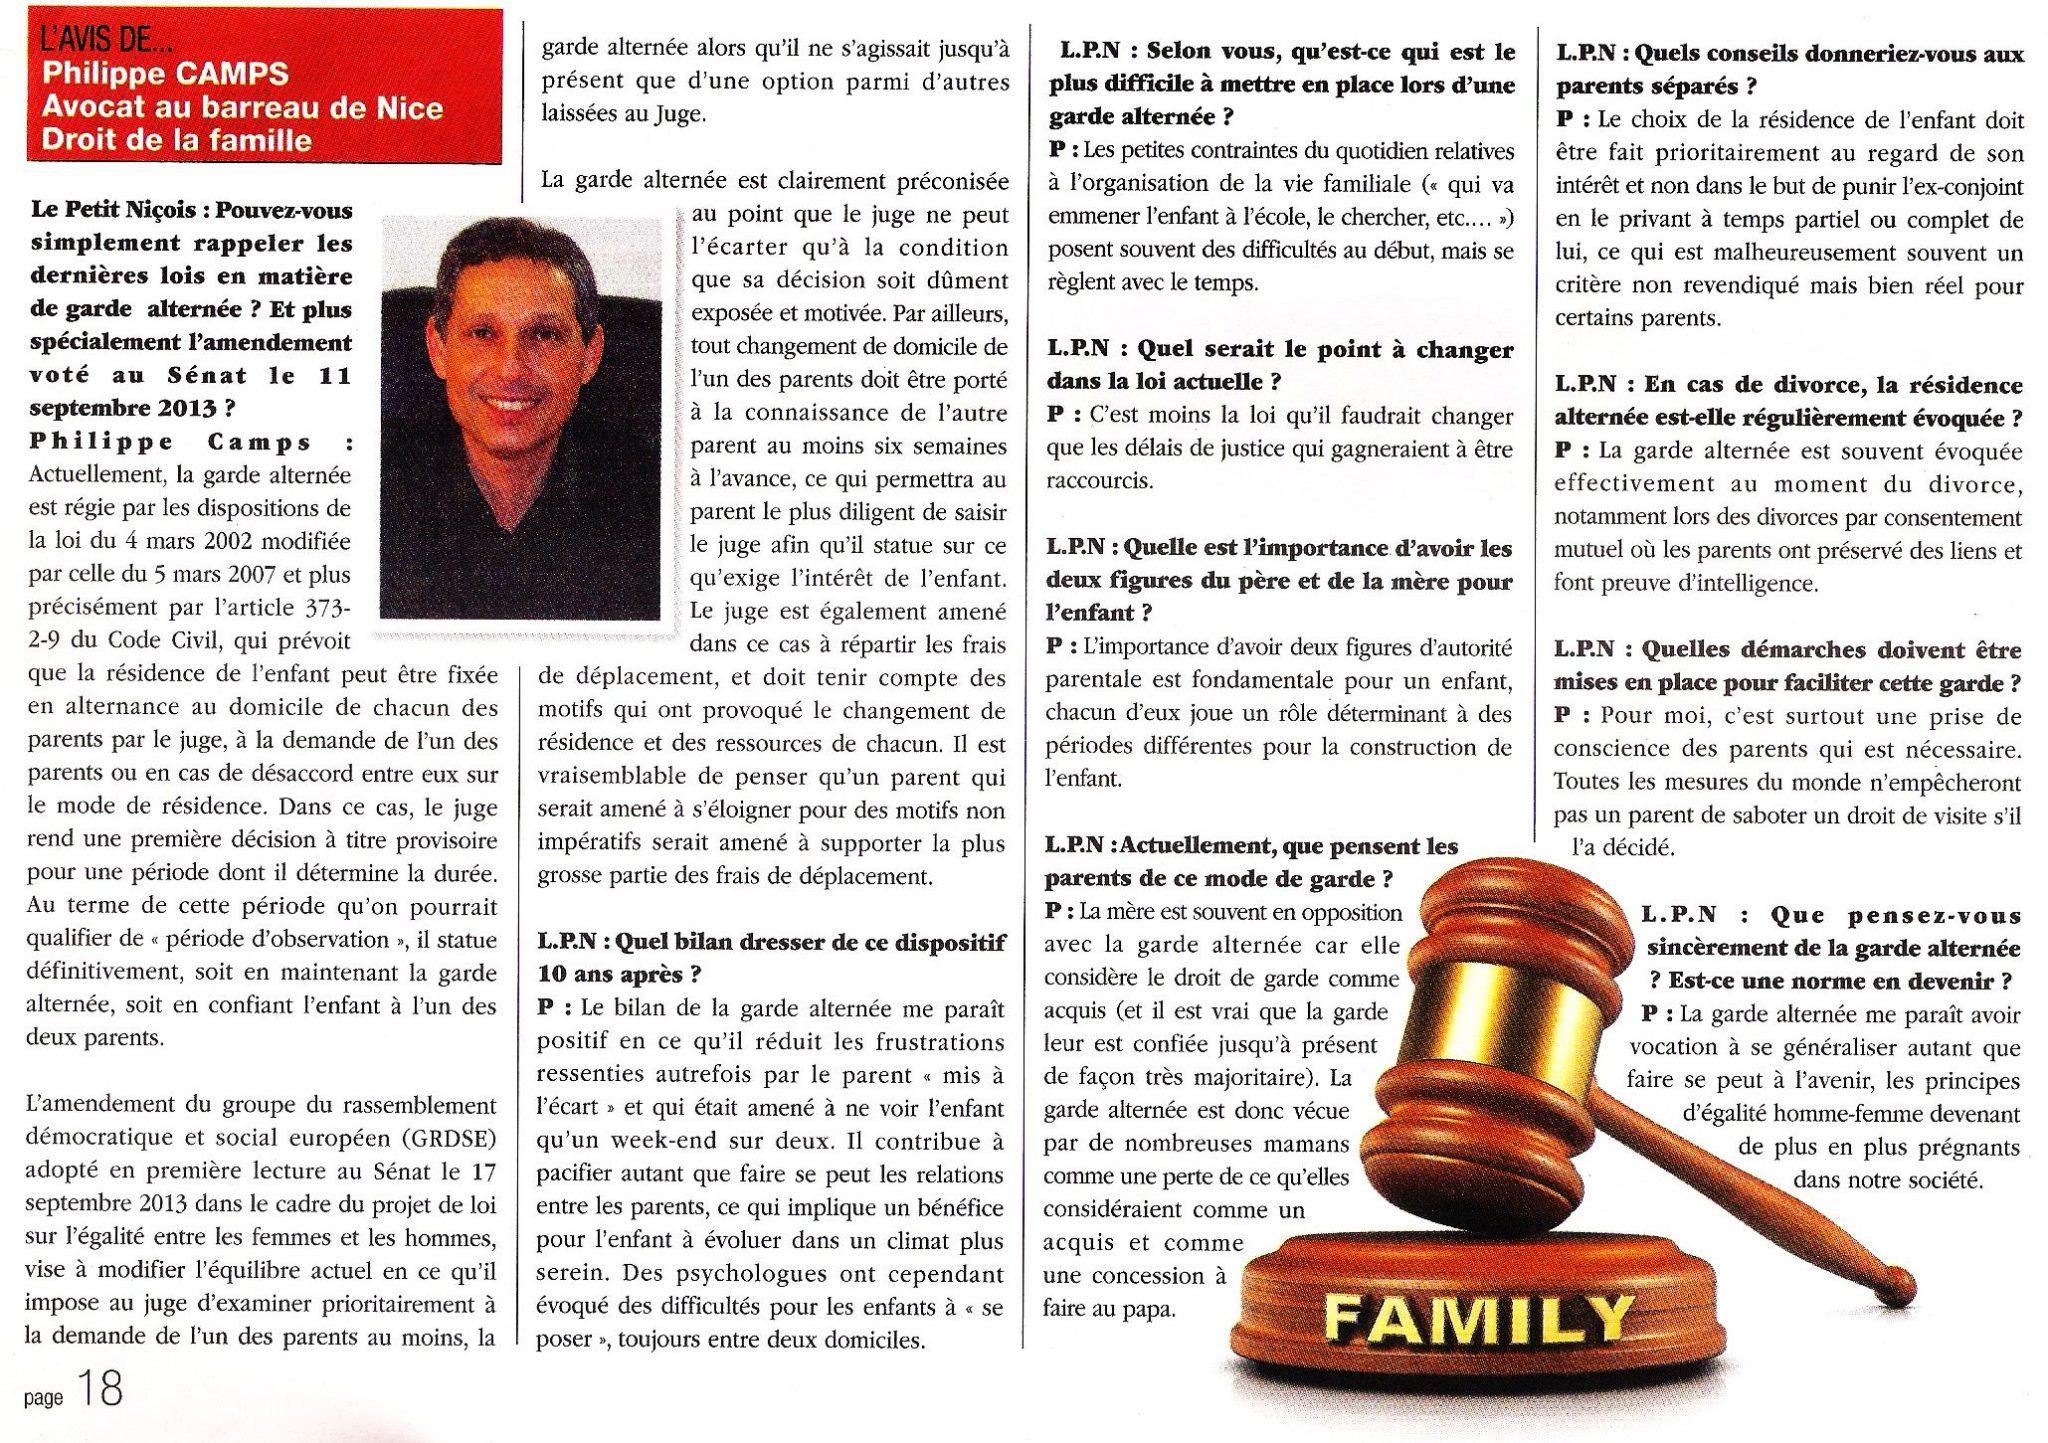 Le-Petit-Nicois-2014-Camps-Philippe-Avocat-Nice